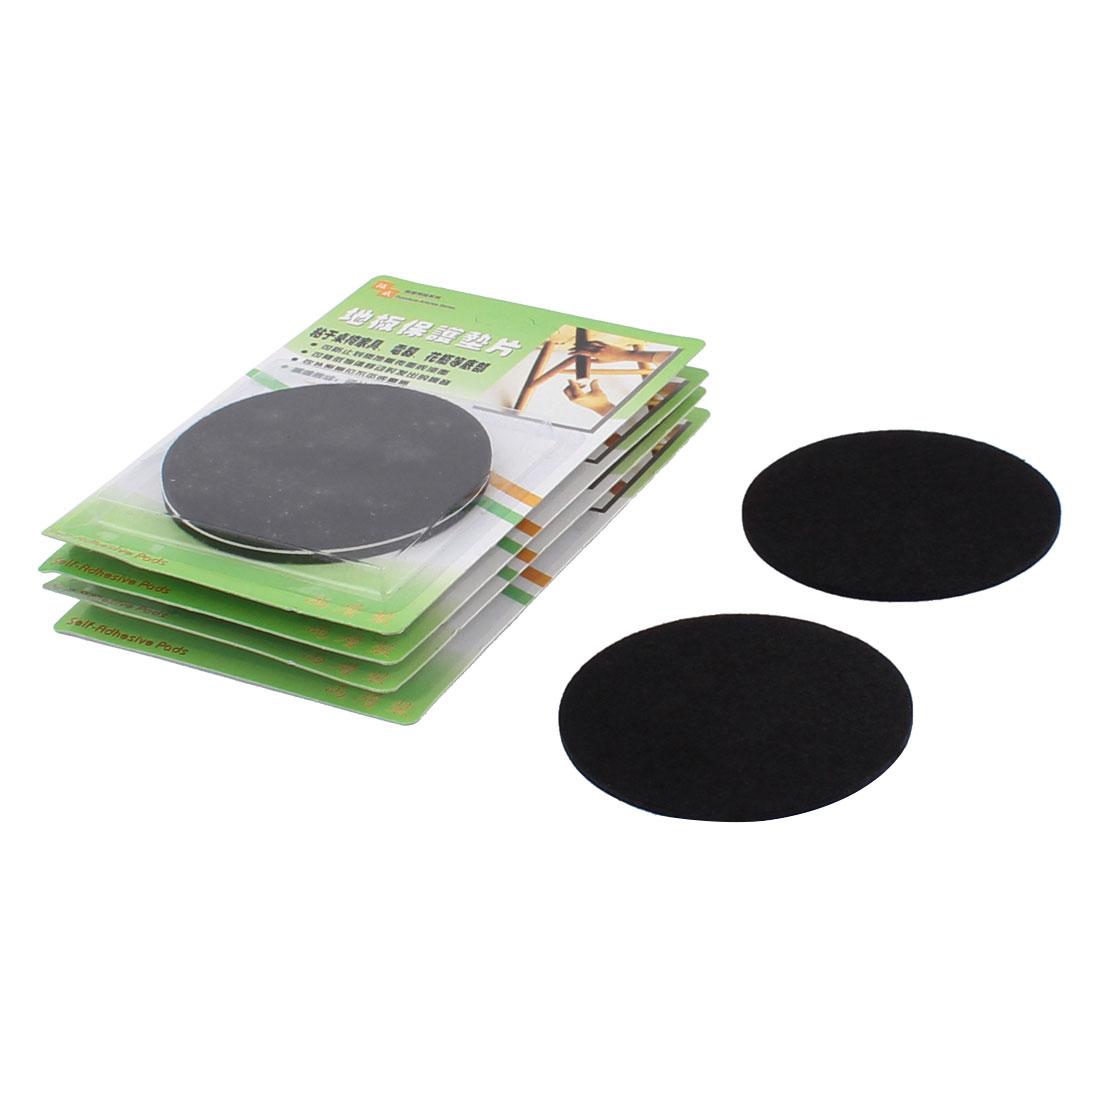 Cabinet Desk Legs Self Adhesive Floor Protection Furniture Felt Pads Mats Black 85mm Diameter 10pcs